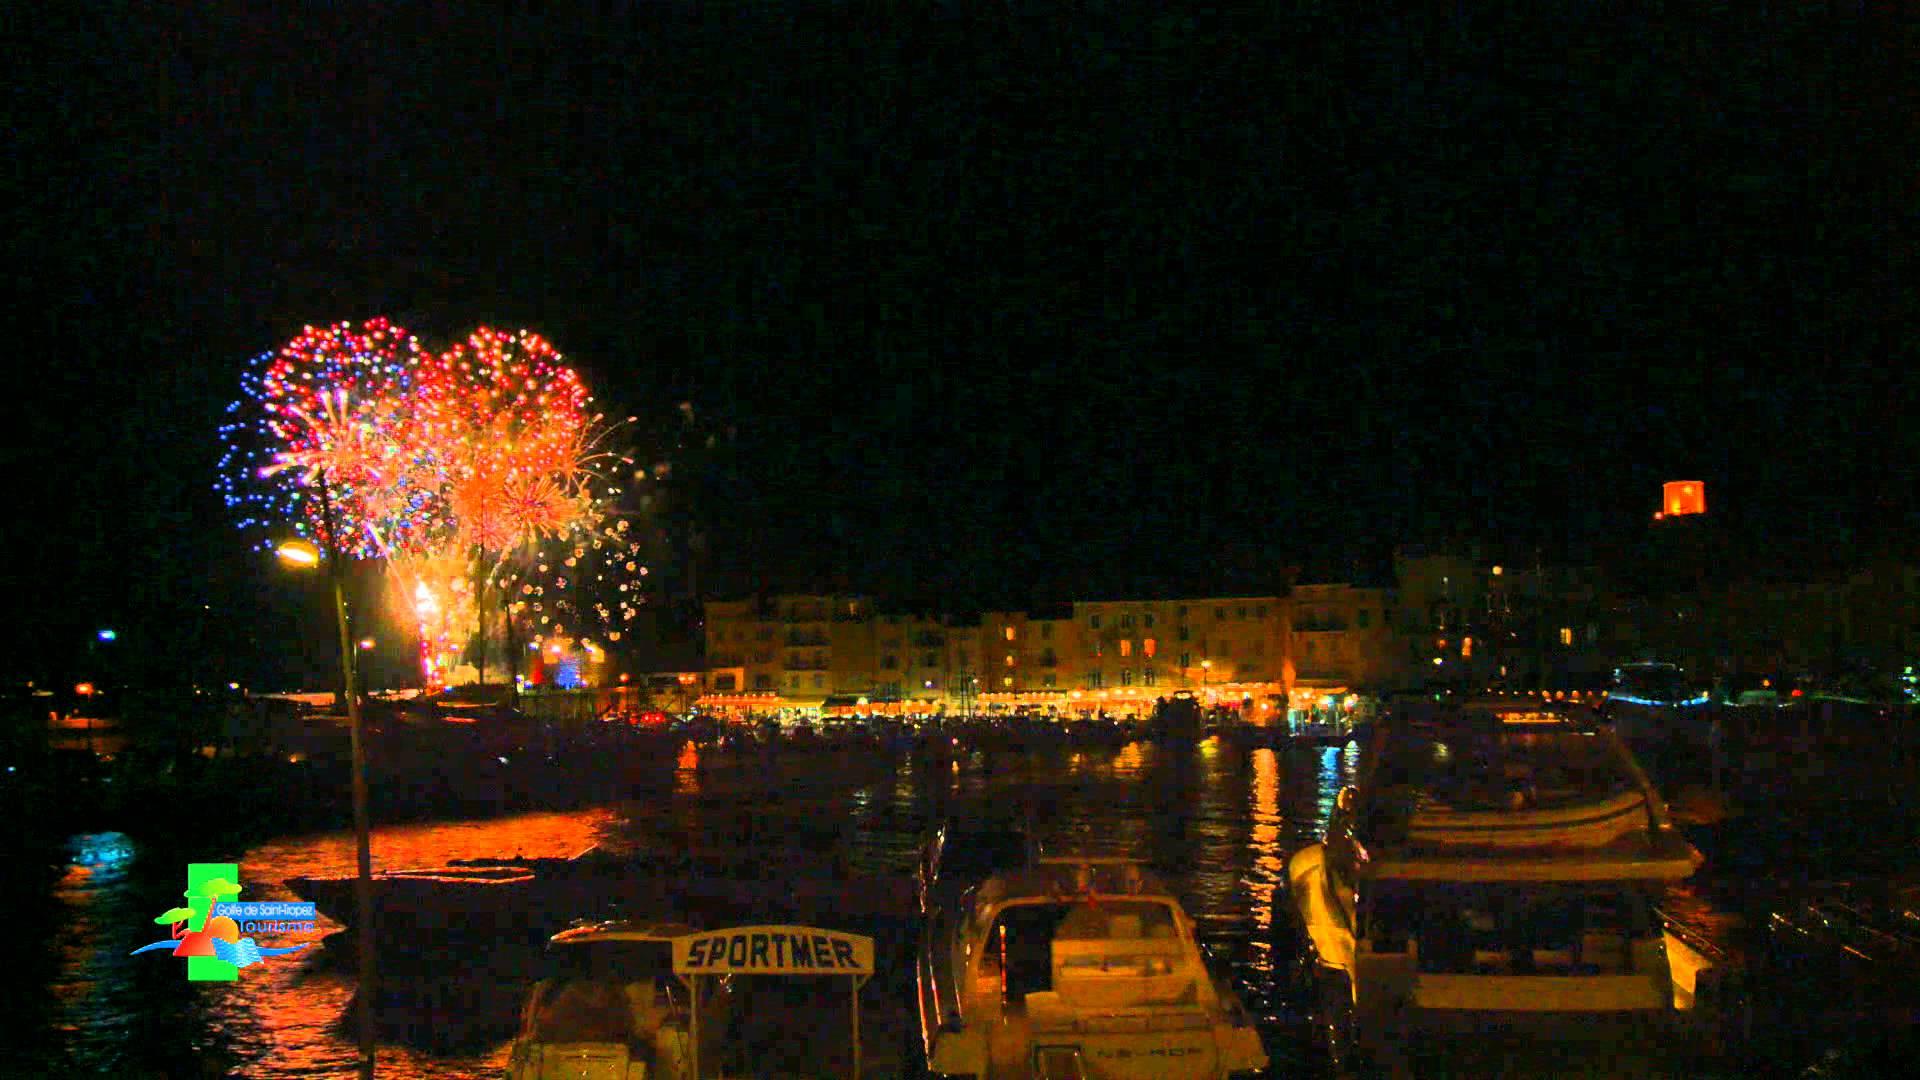 Fireworks in Saint-Tropez - All Luxury Apartments